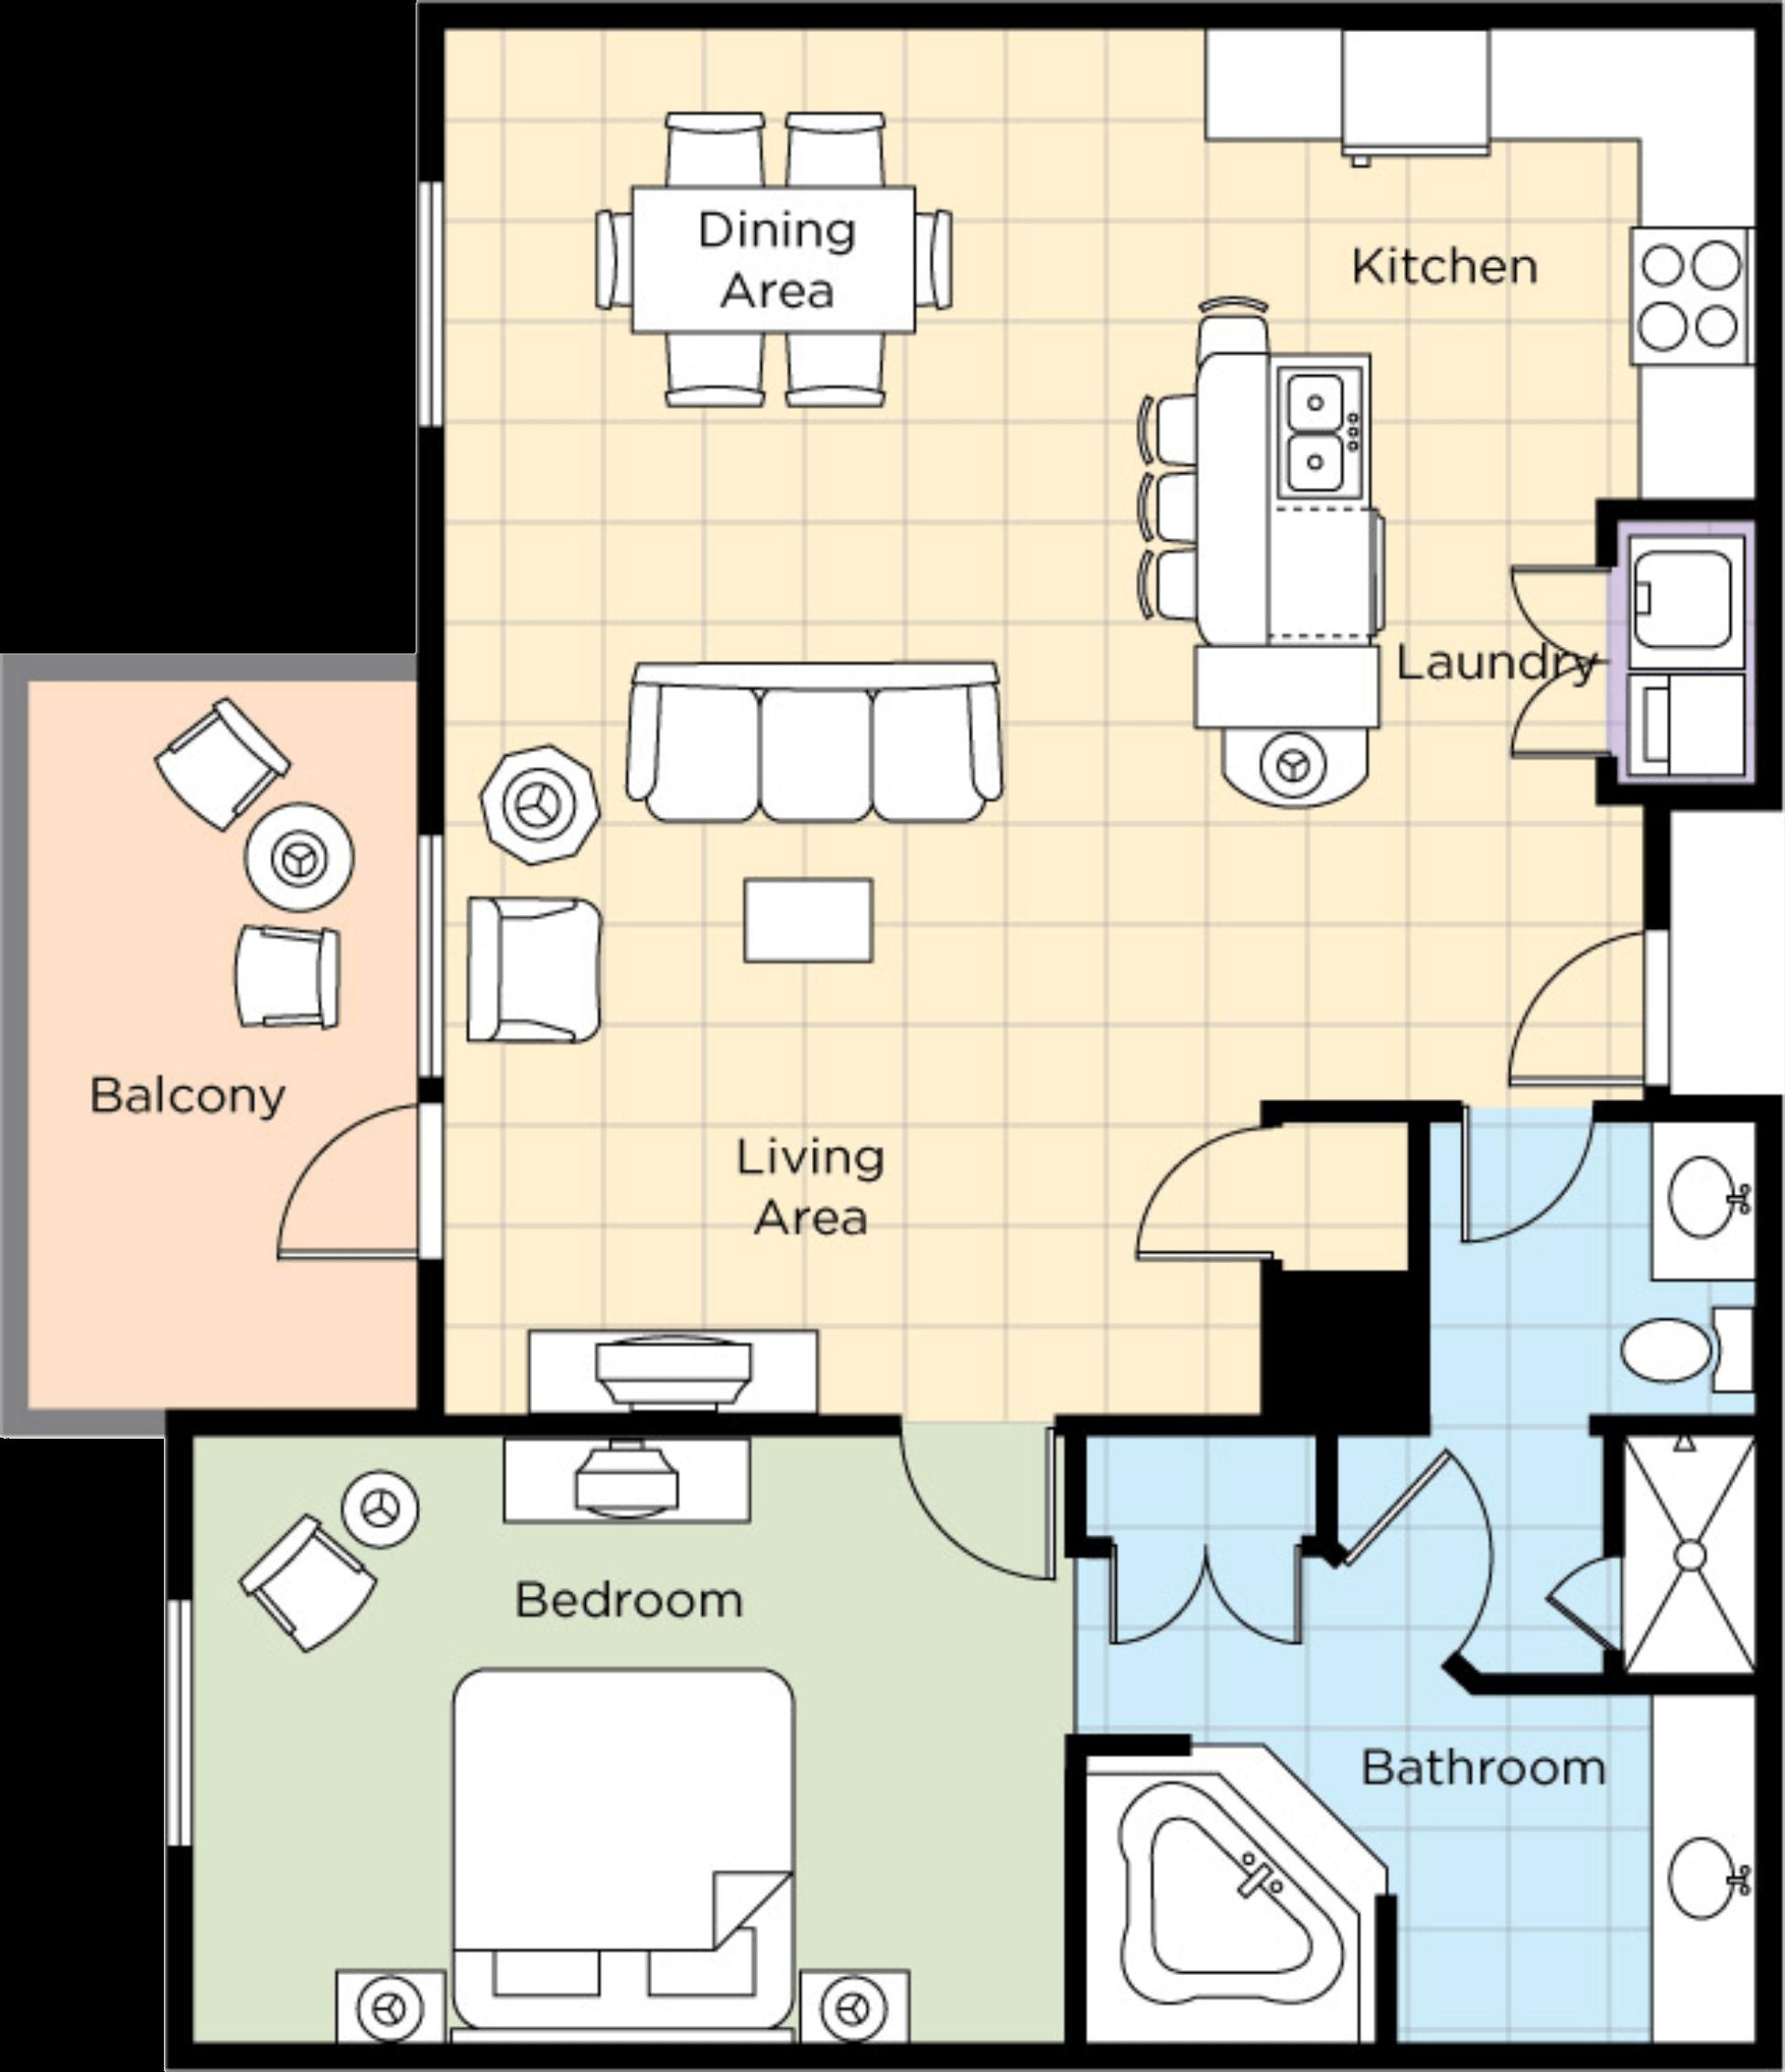 Image of floorplan for One Bedroom Presidential